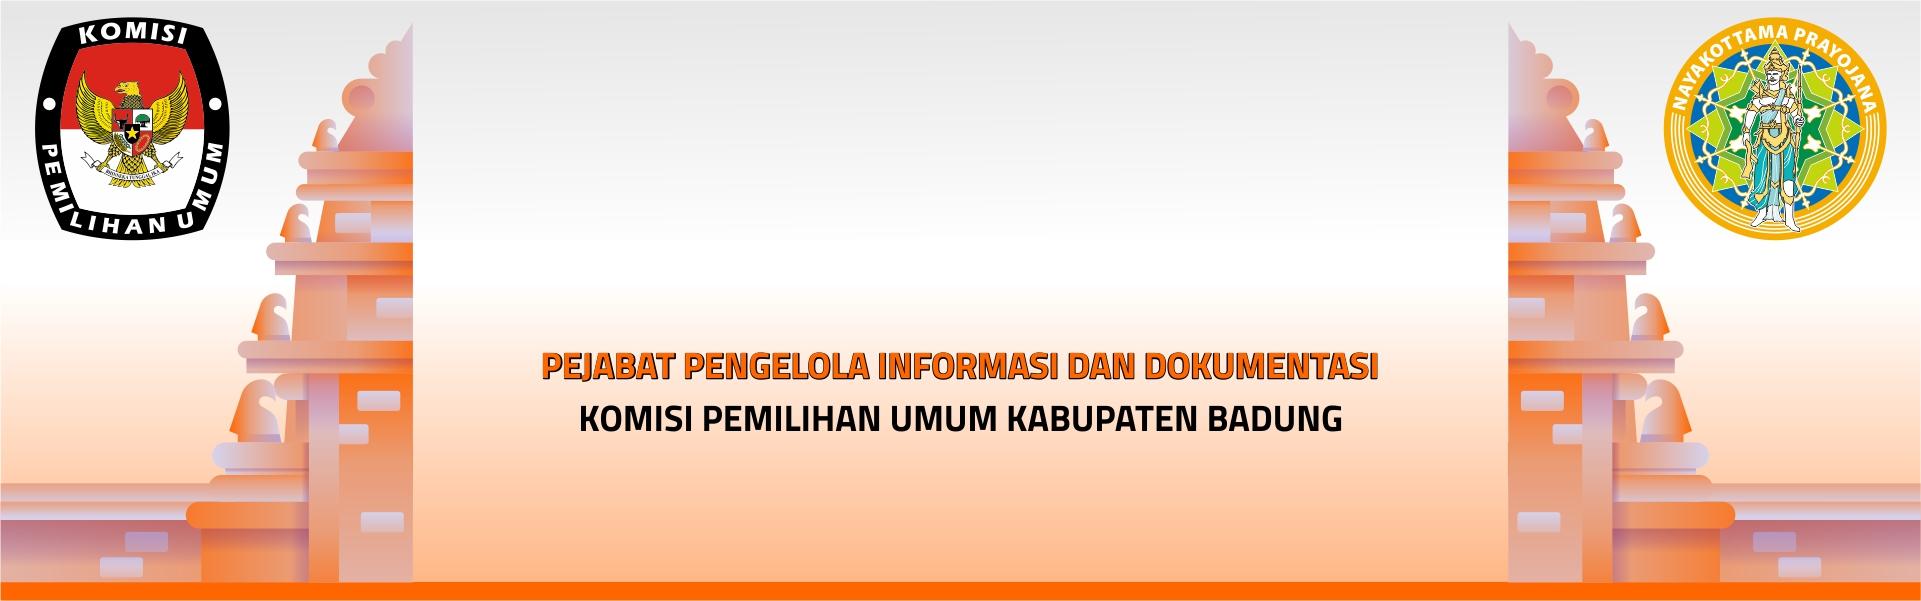 e-PPID KPU KABUPATEN BADUNG